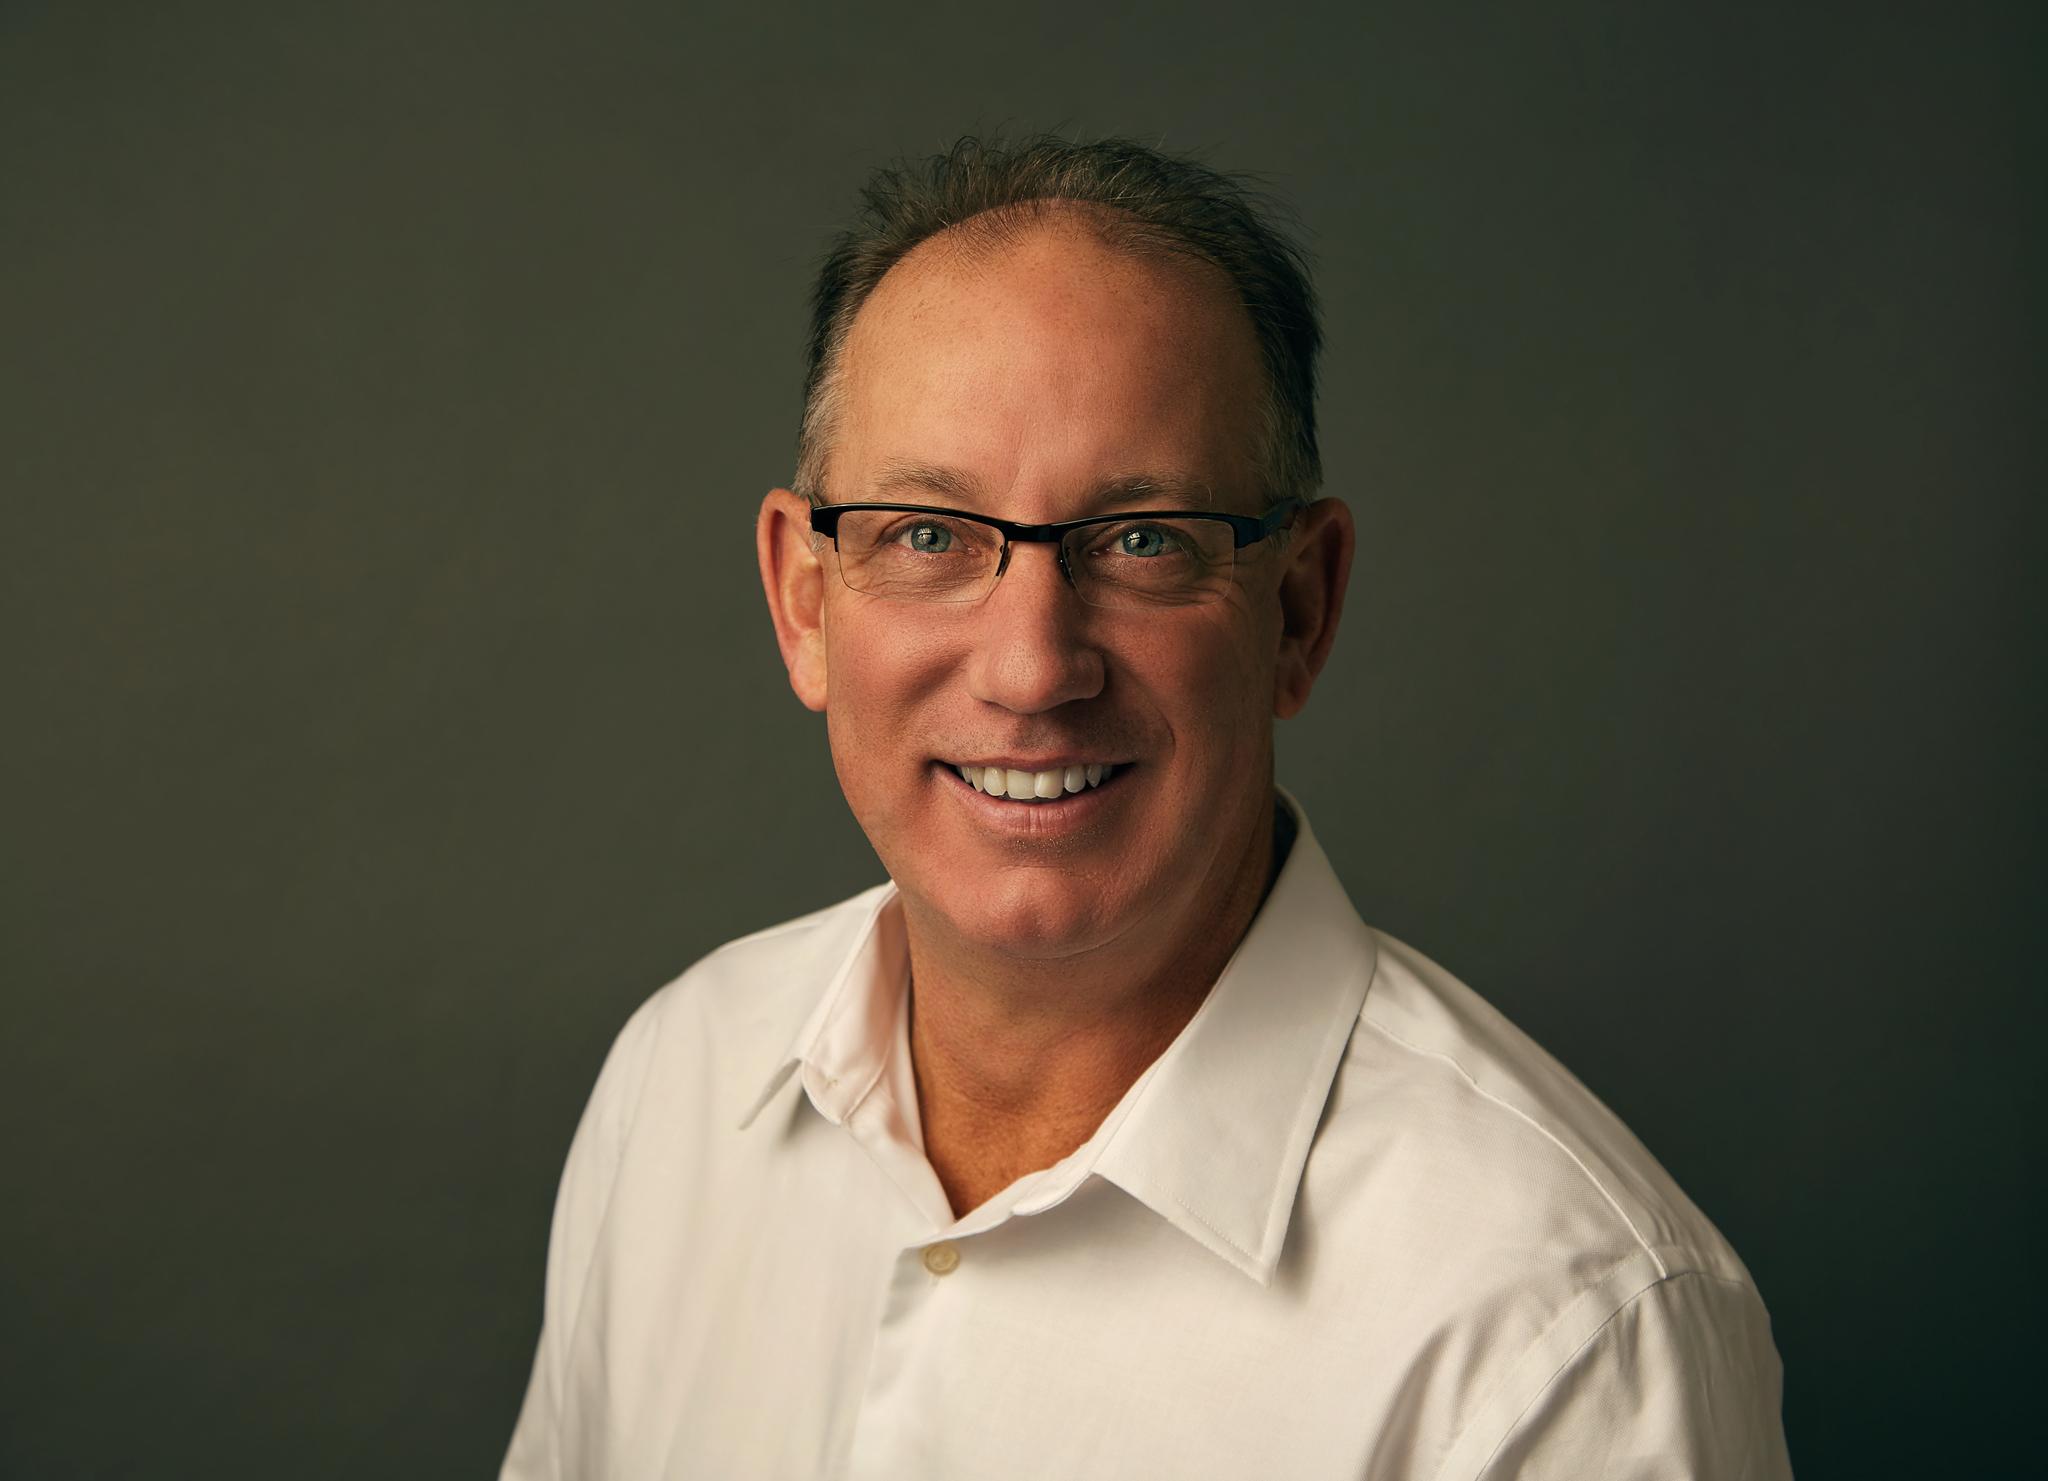 Phoenix Corporate Headshot Photographer